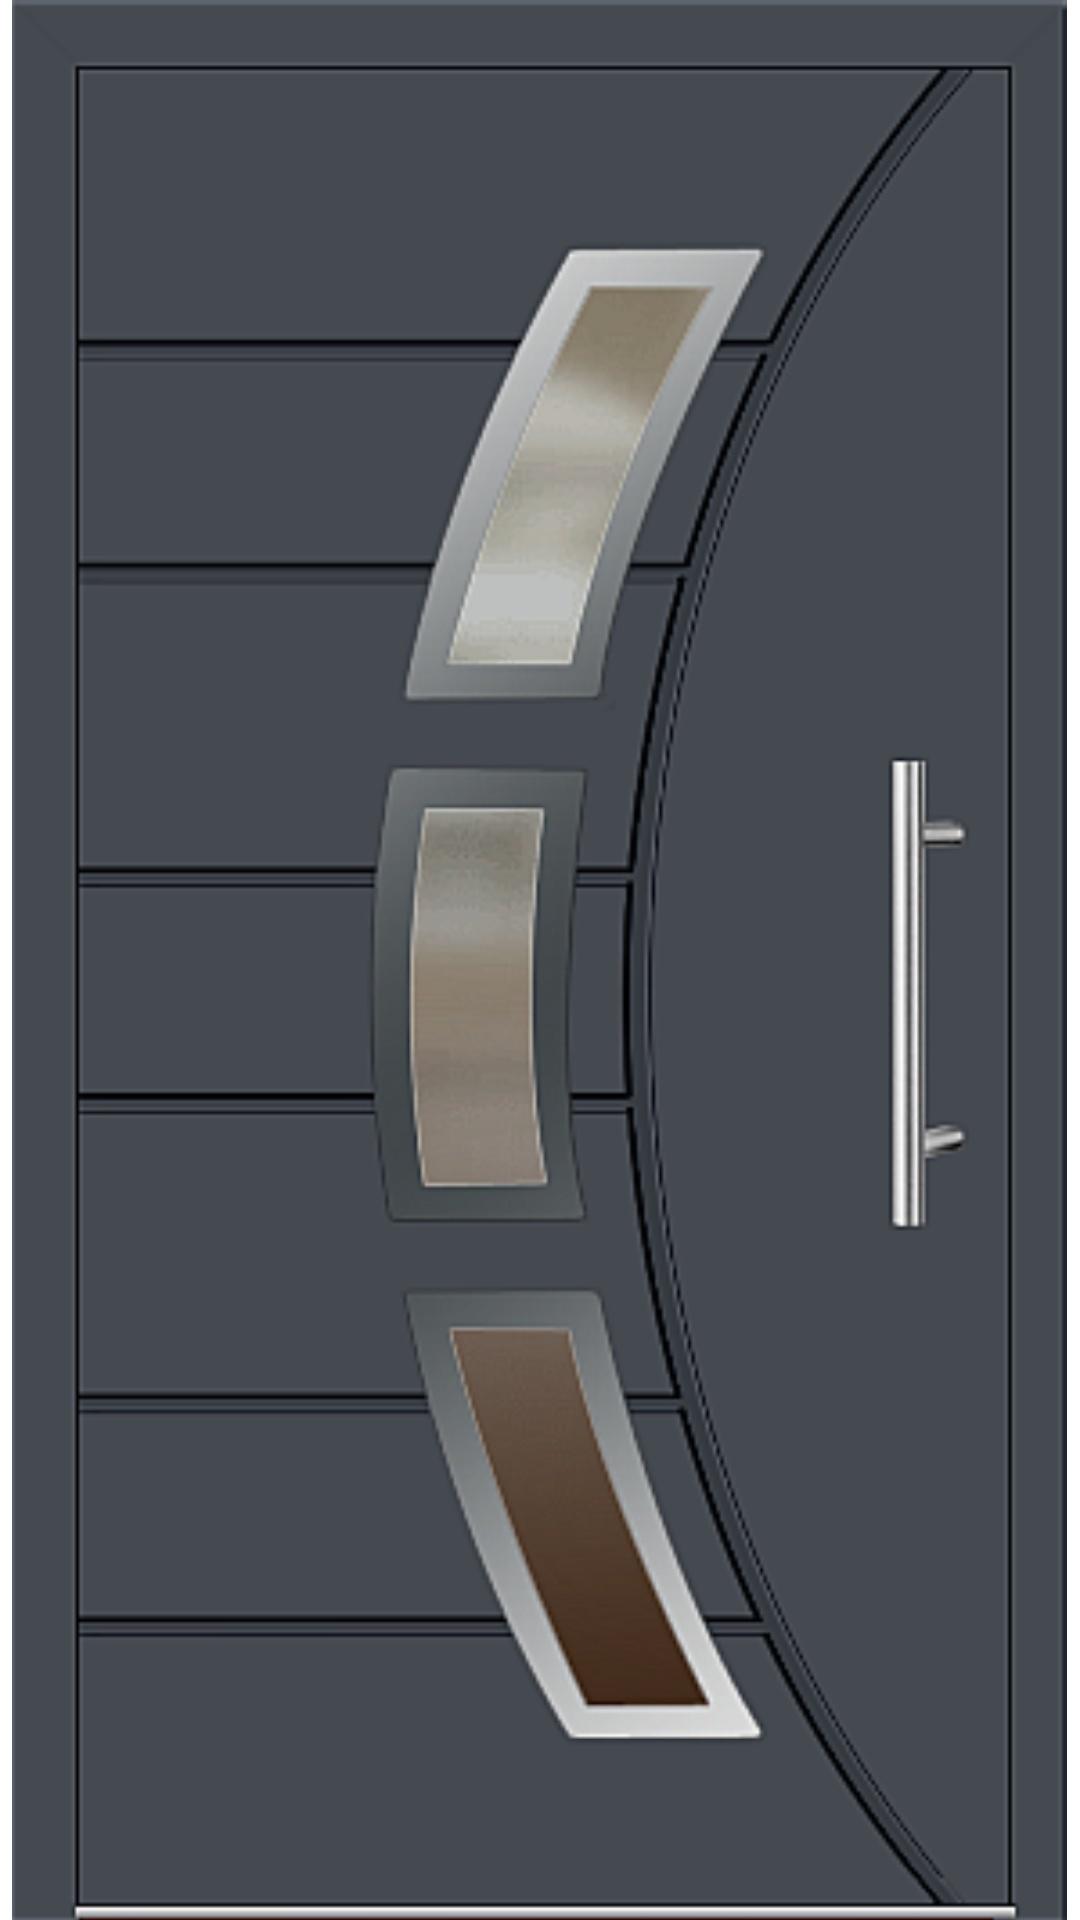 Aluminium Haustür Modell 6437-72 graphitgrau